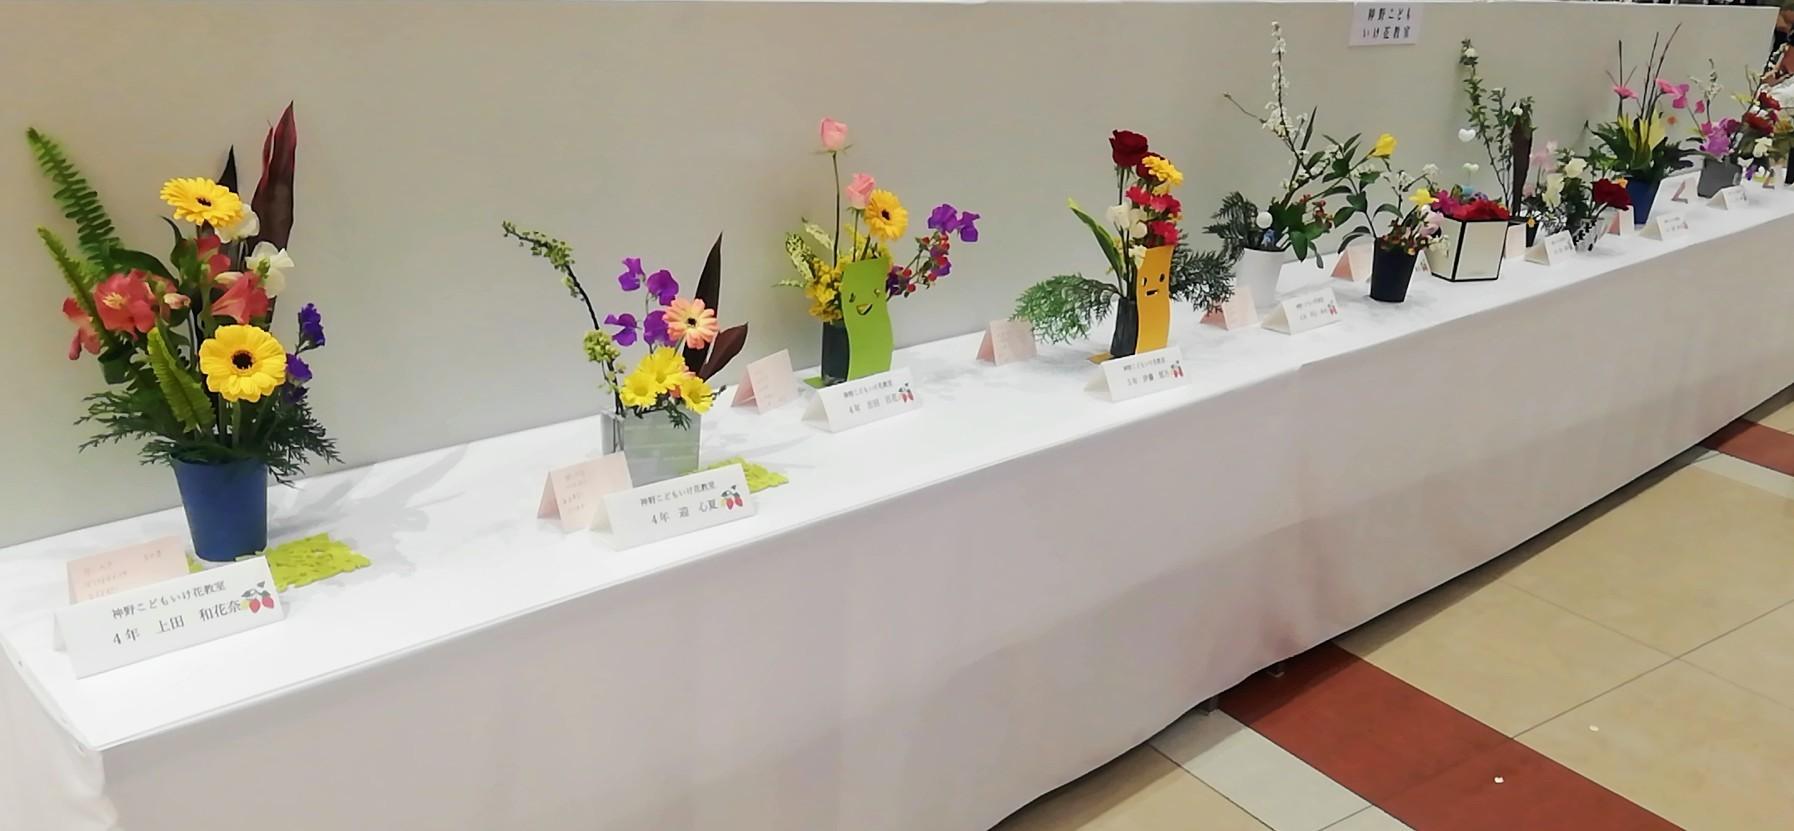 池坊佐賀県連合支部創立100周年記念いけばな池坊展 前期_d0195183_00182347.jpg